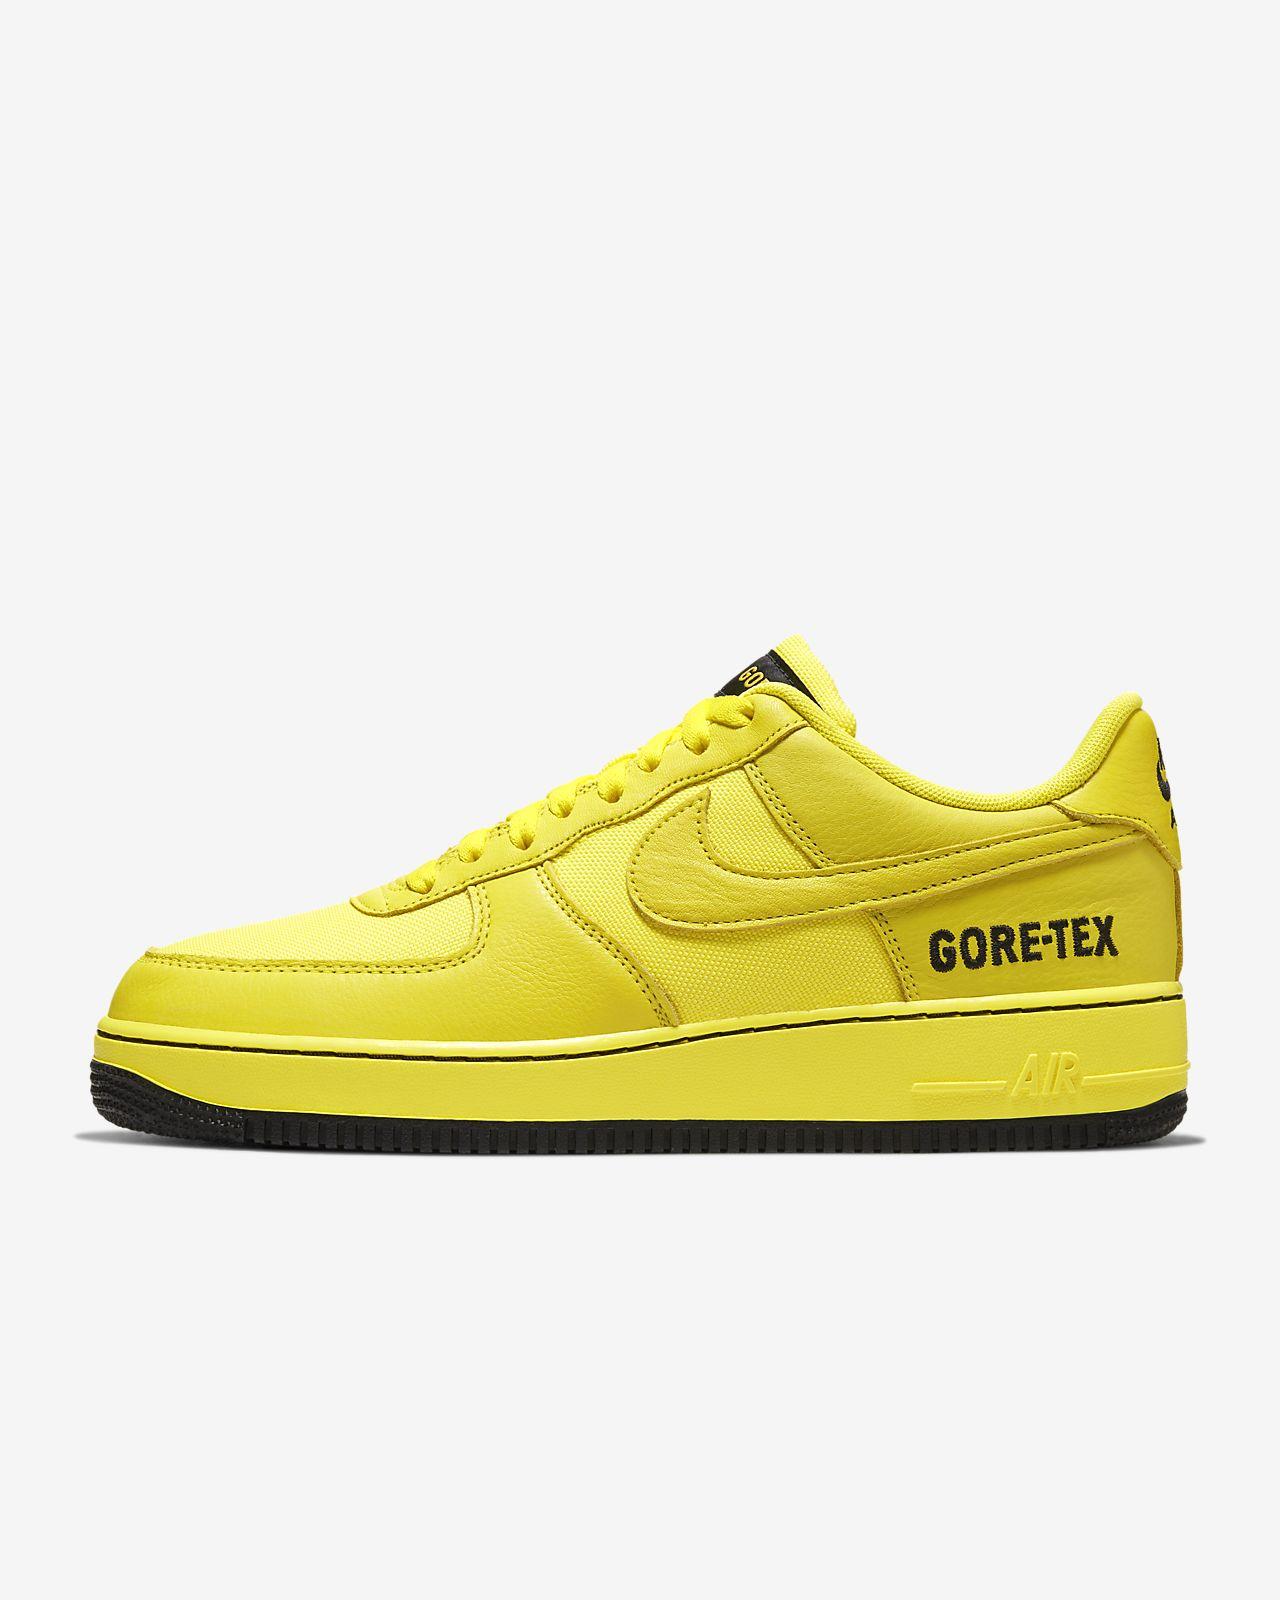 Scarpa Nike Air Force 1 GORE-TEX